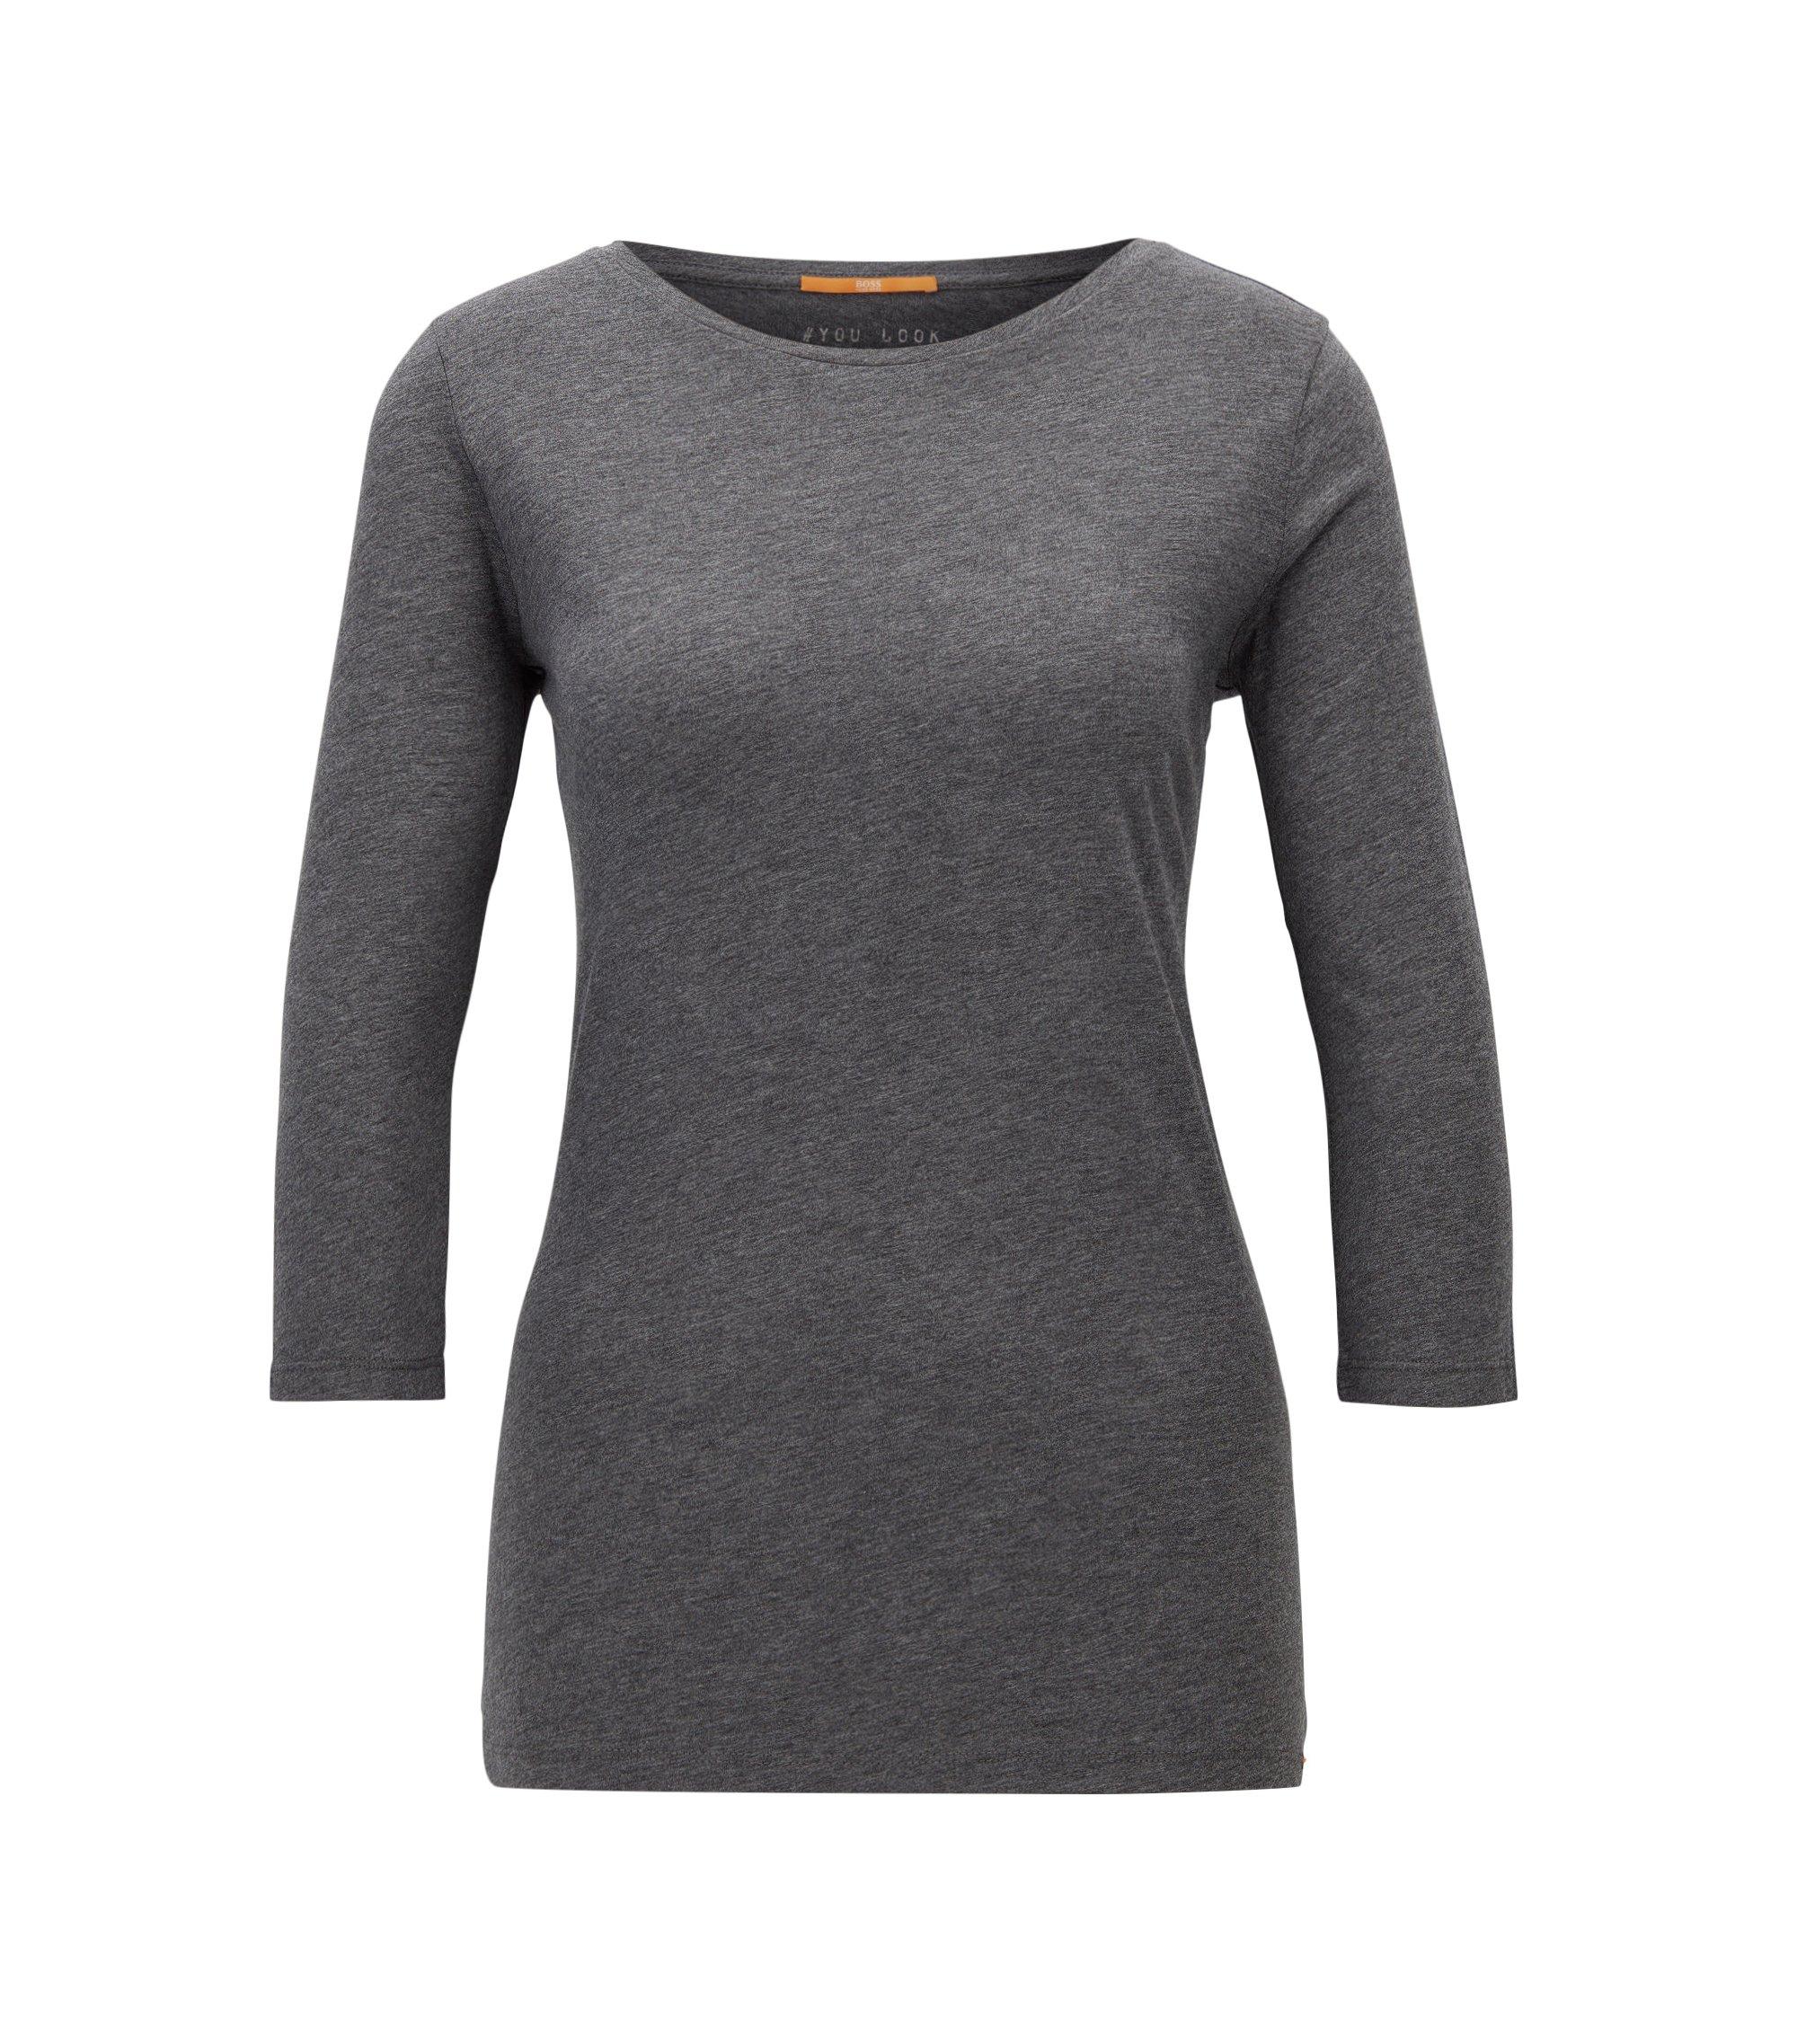 T-shirt slim fit in misto cotone, Grigio antracite